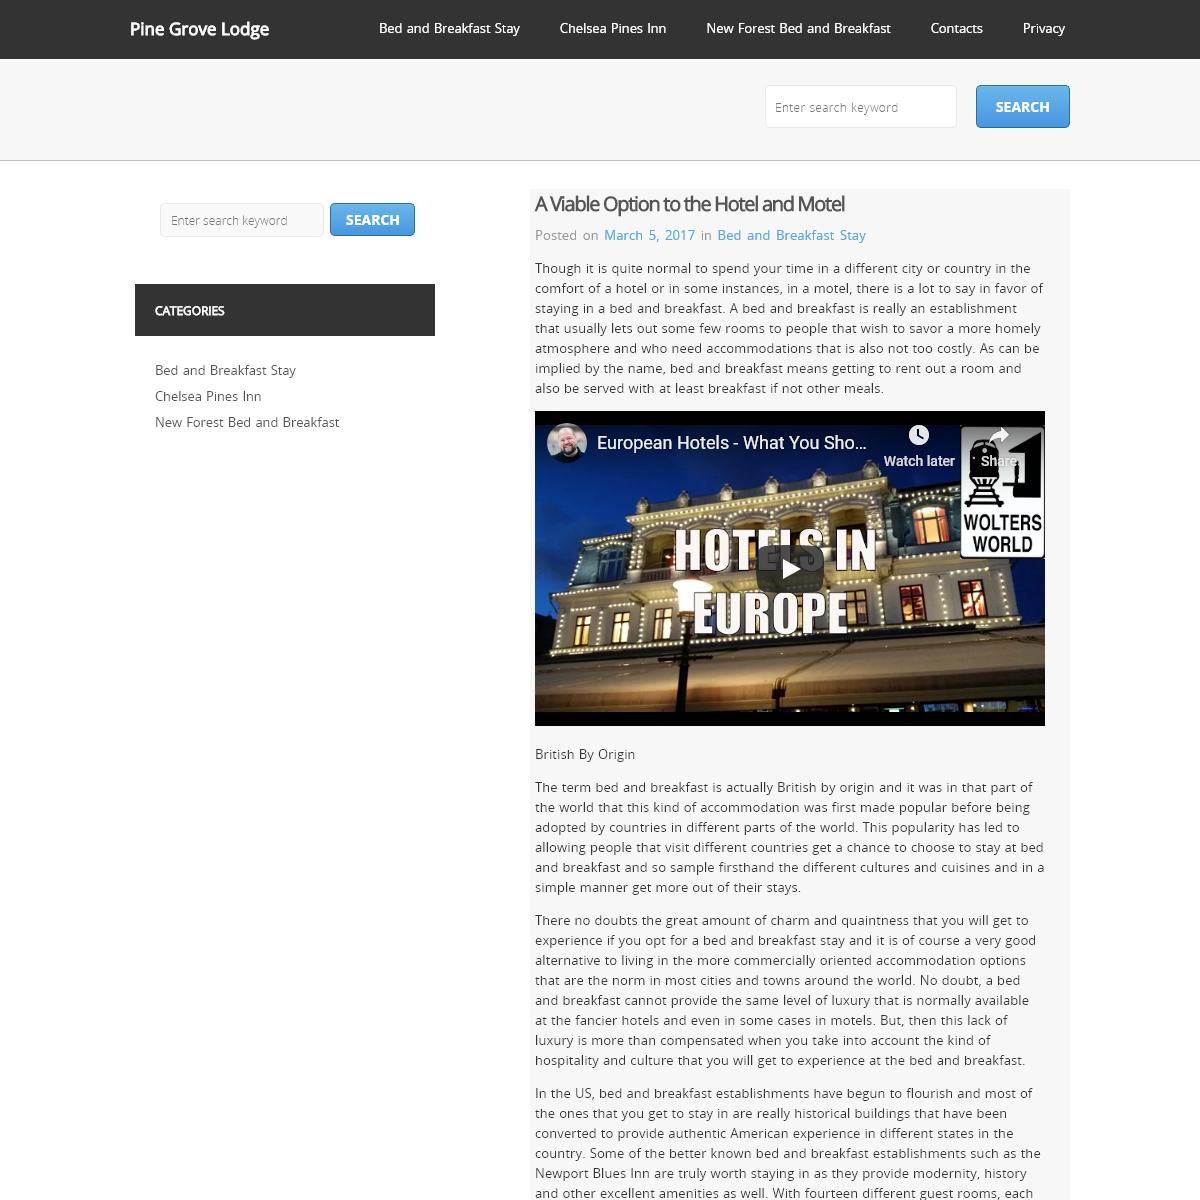 Pine Grove Lodge -